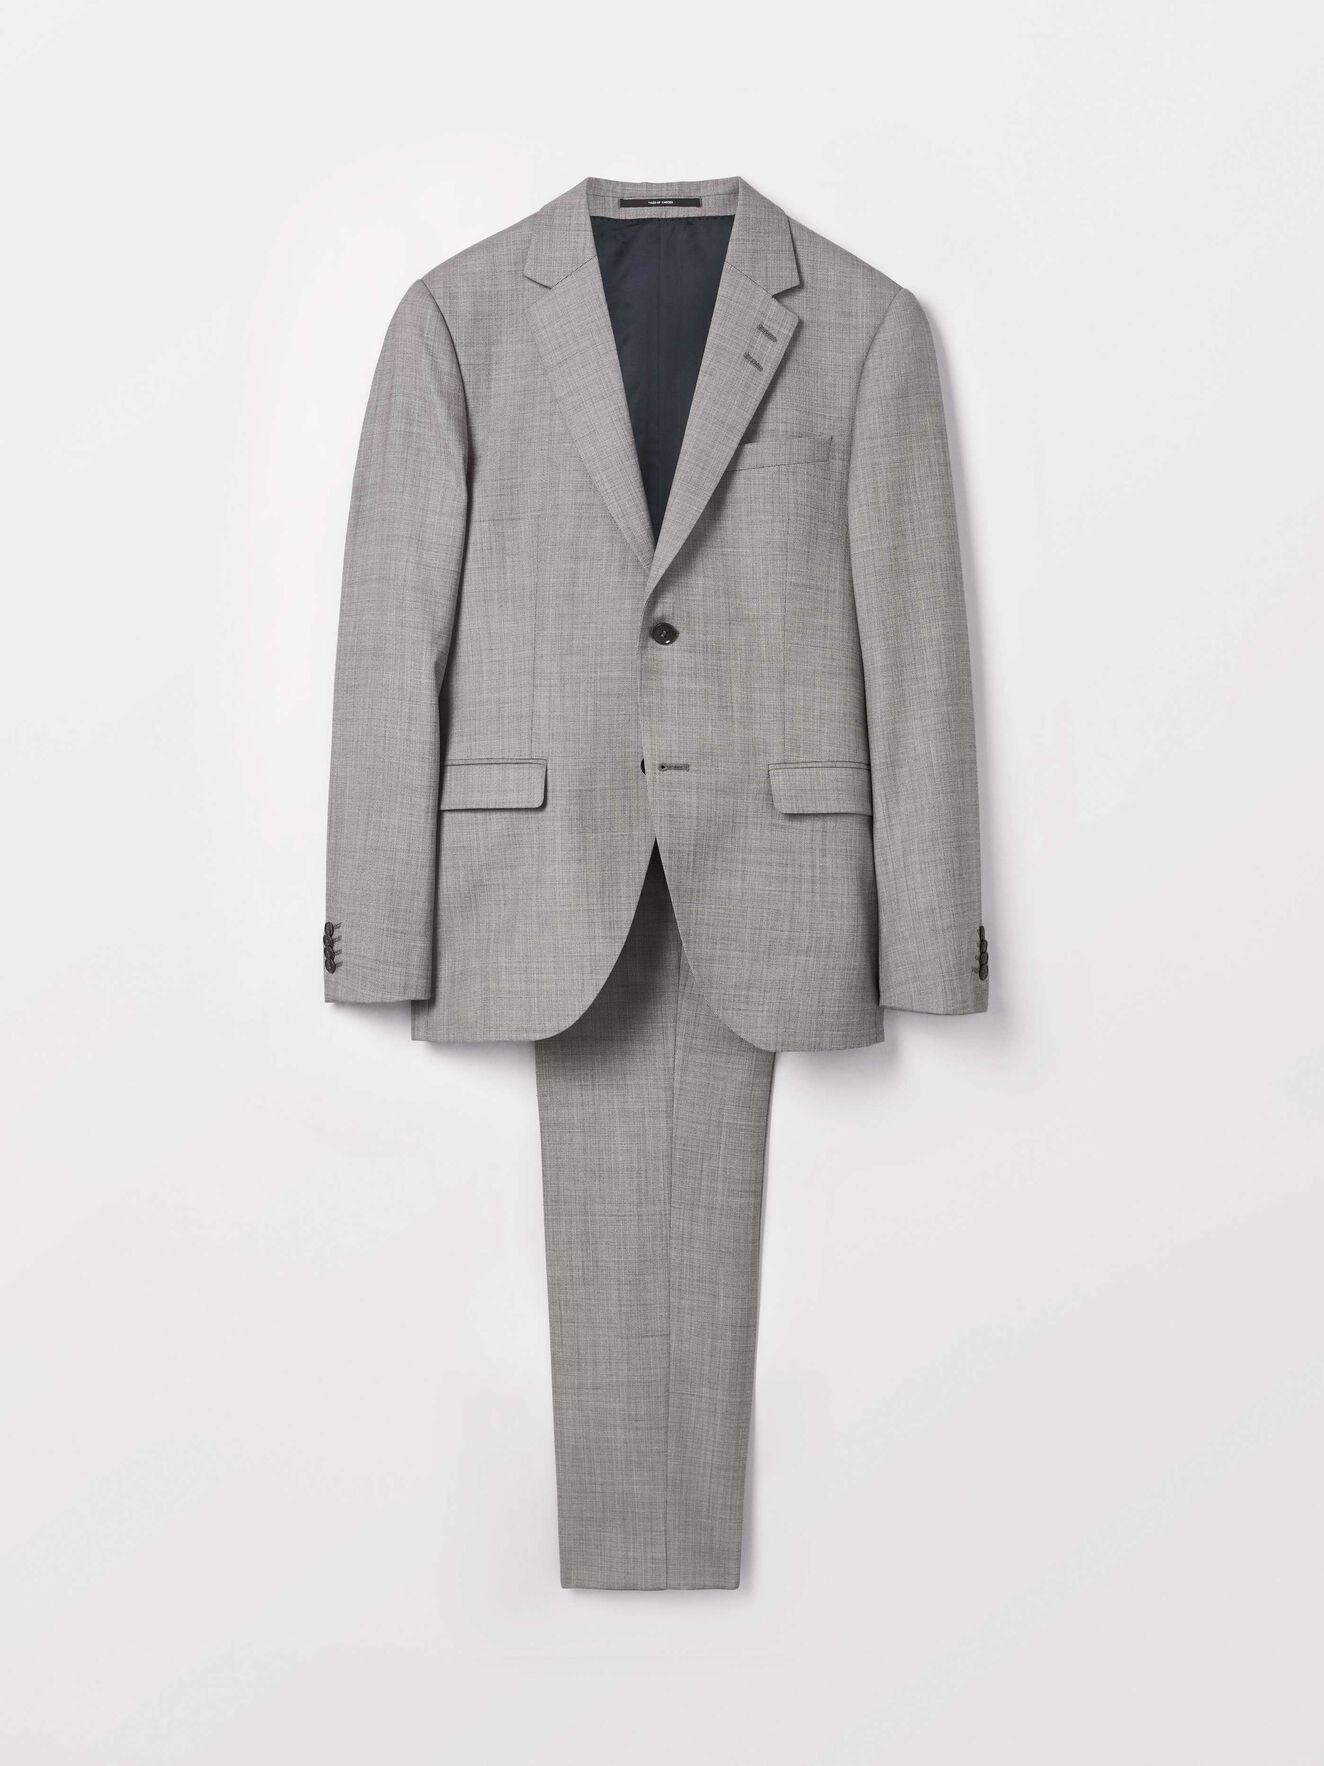 best website 4fe80 68366 S.Jamonte Anzug - Men Online kaufen